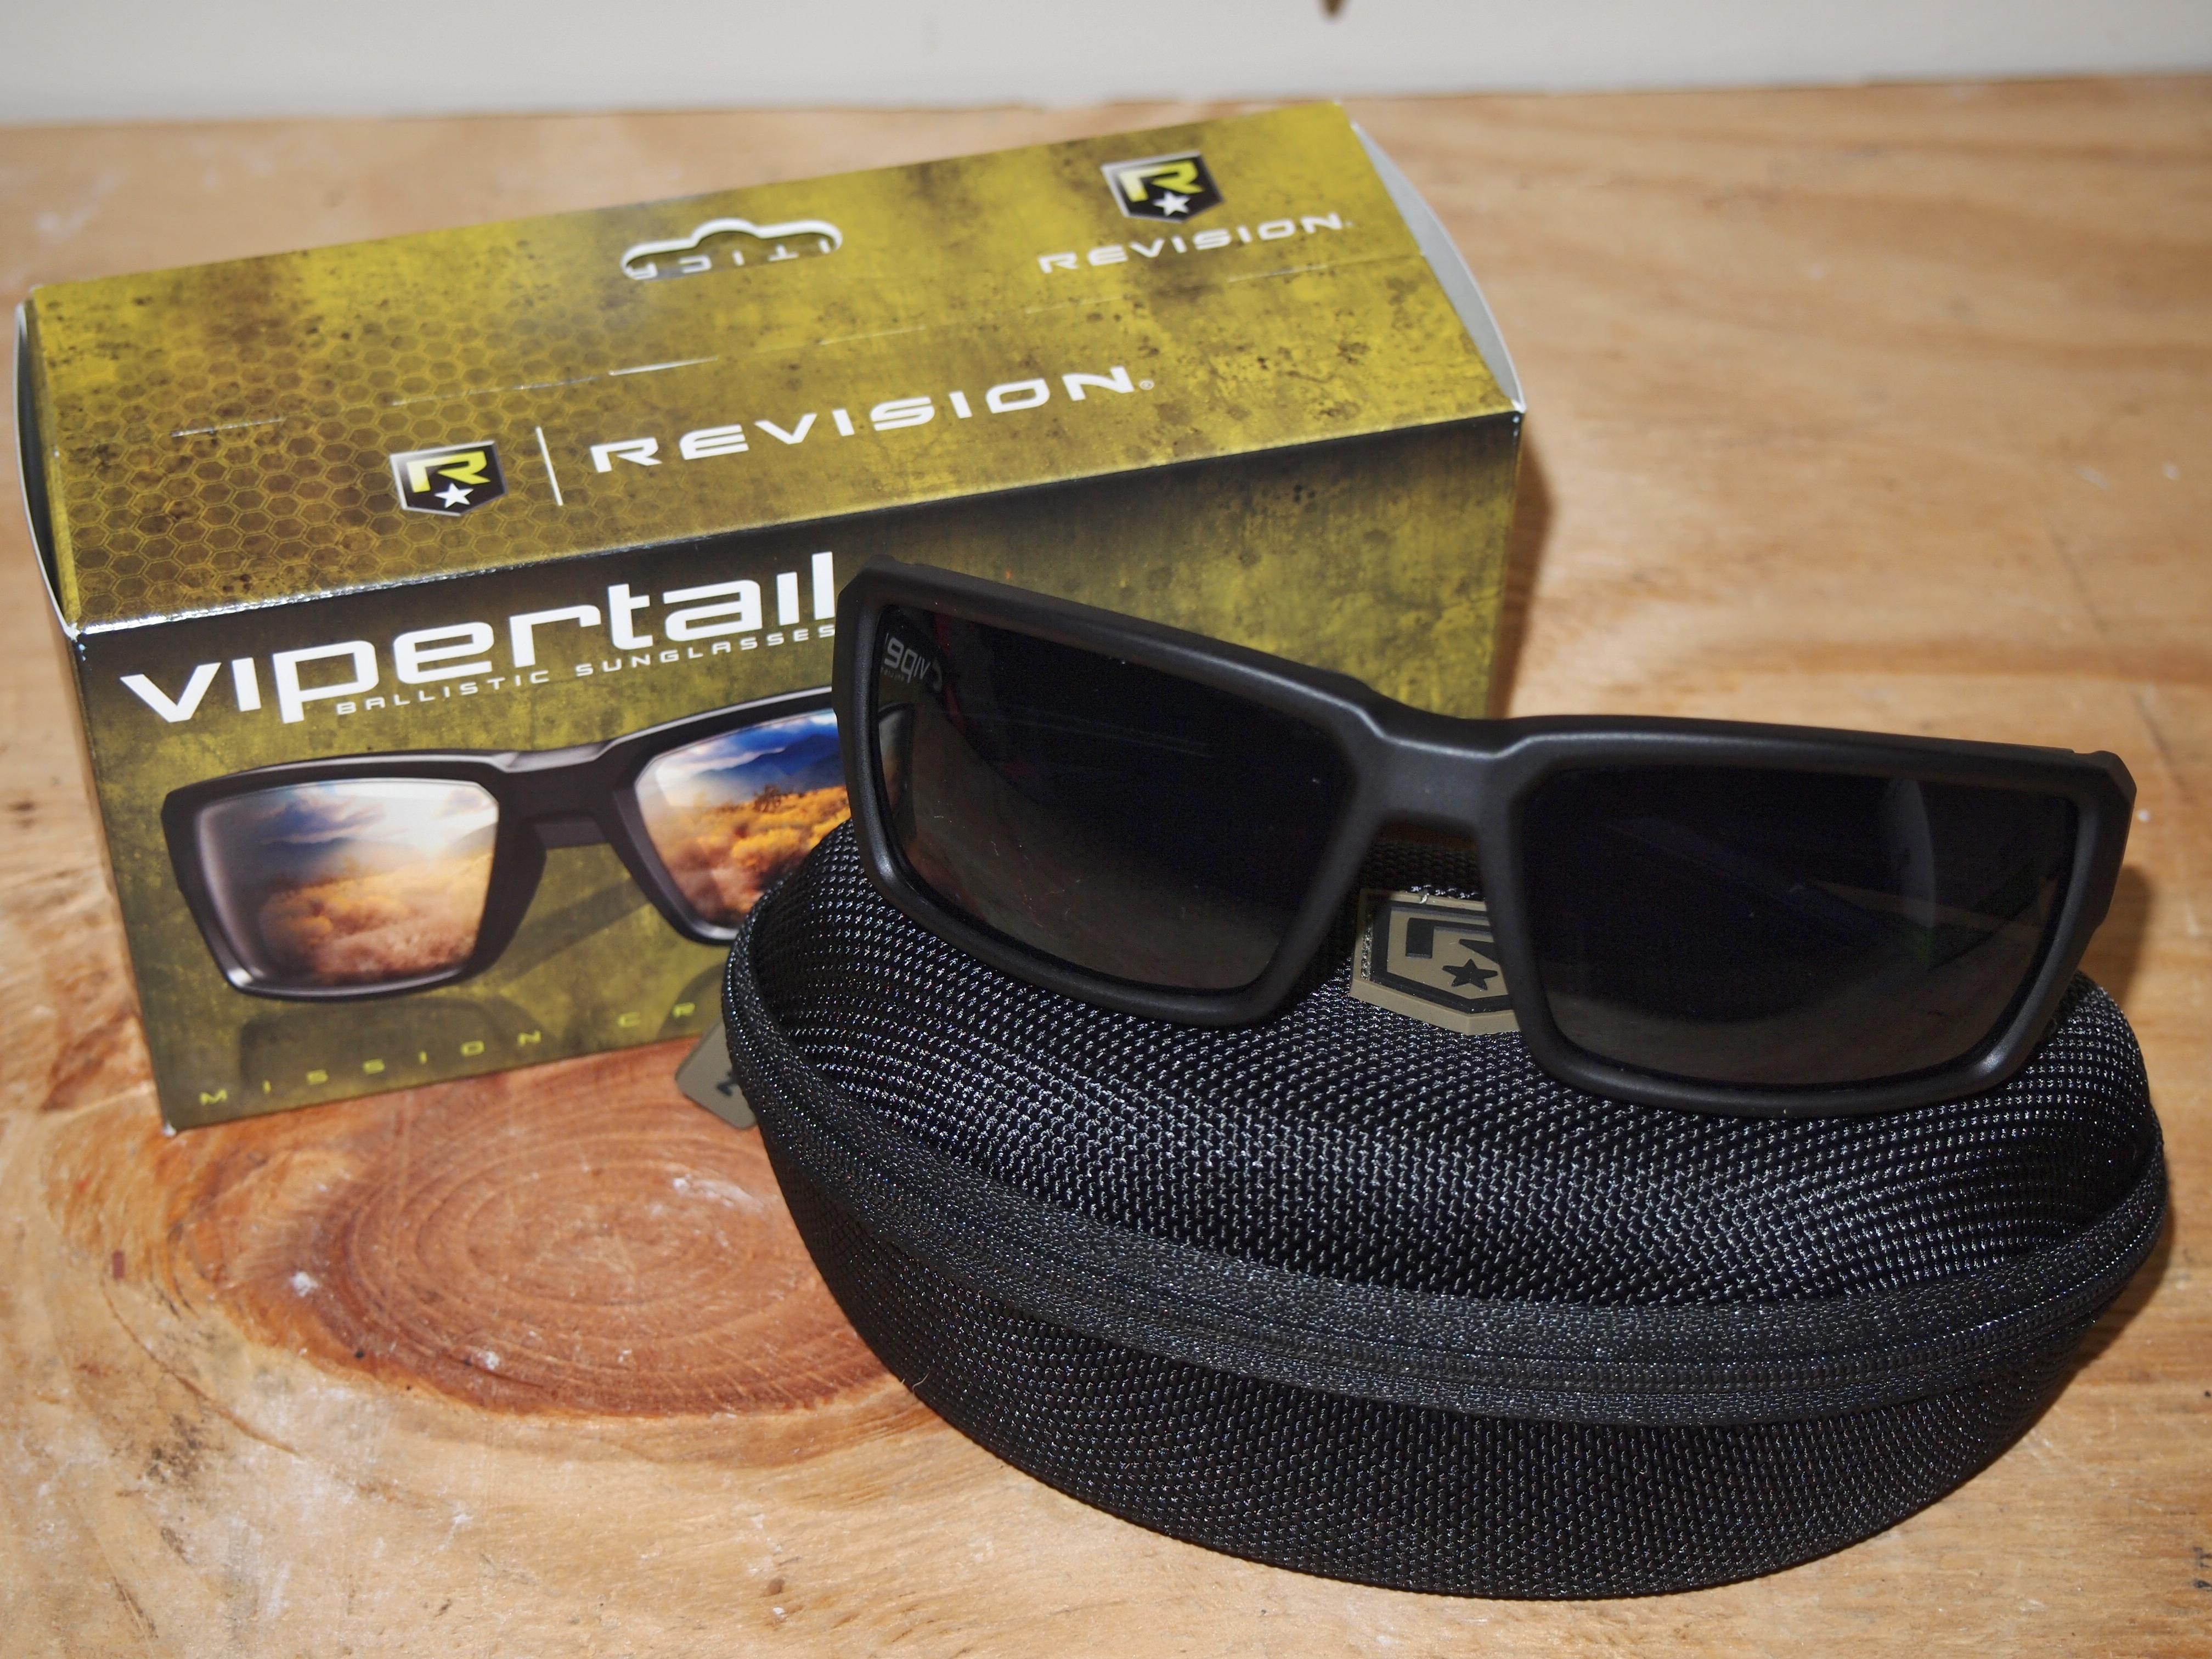 576ef8cdf01 Review  Revision Vipertail Ballistic Sunglasses - Gunmart Blog